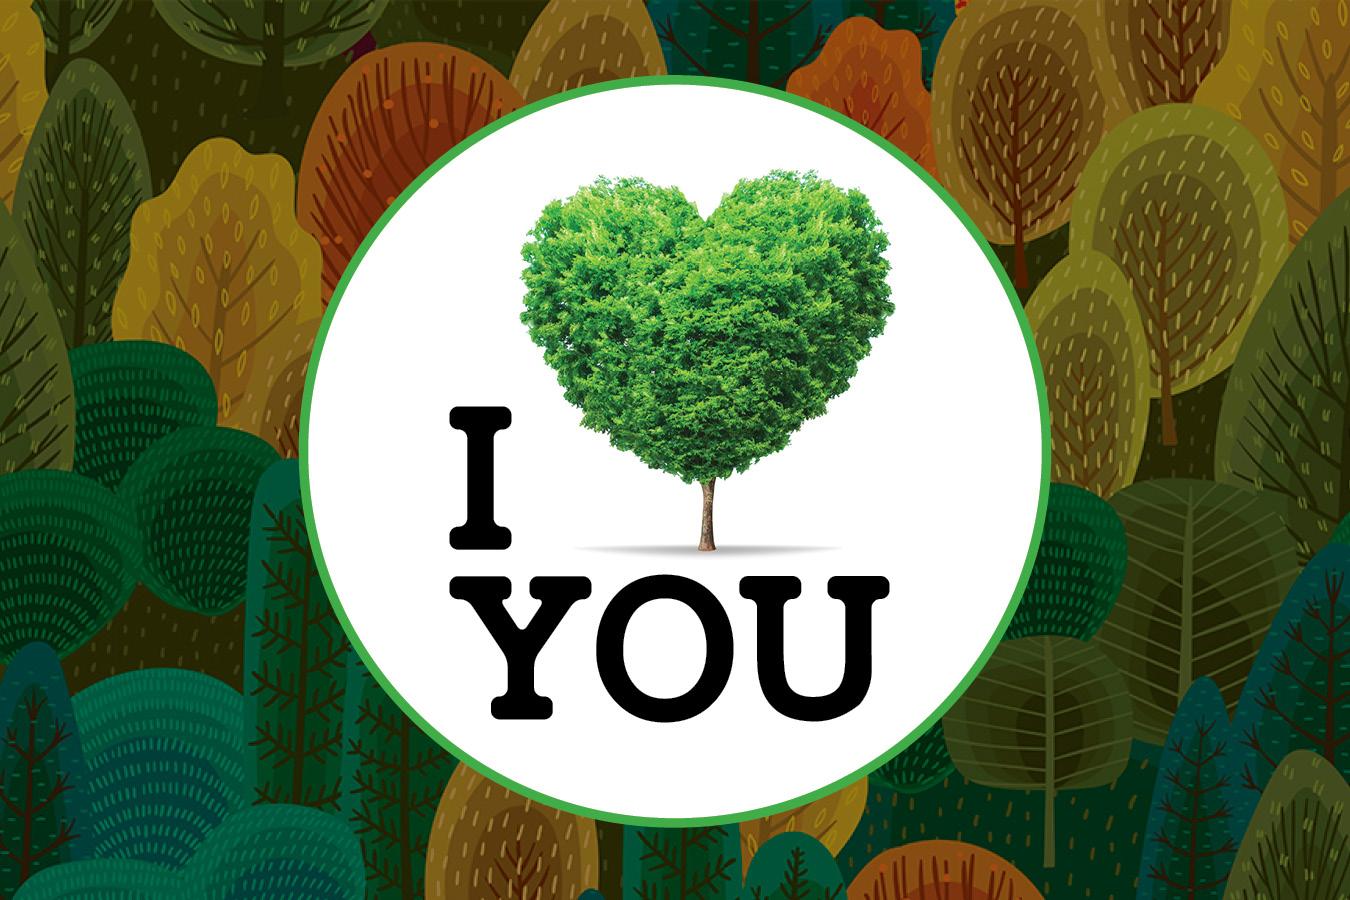 Image_I Tree You